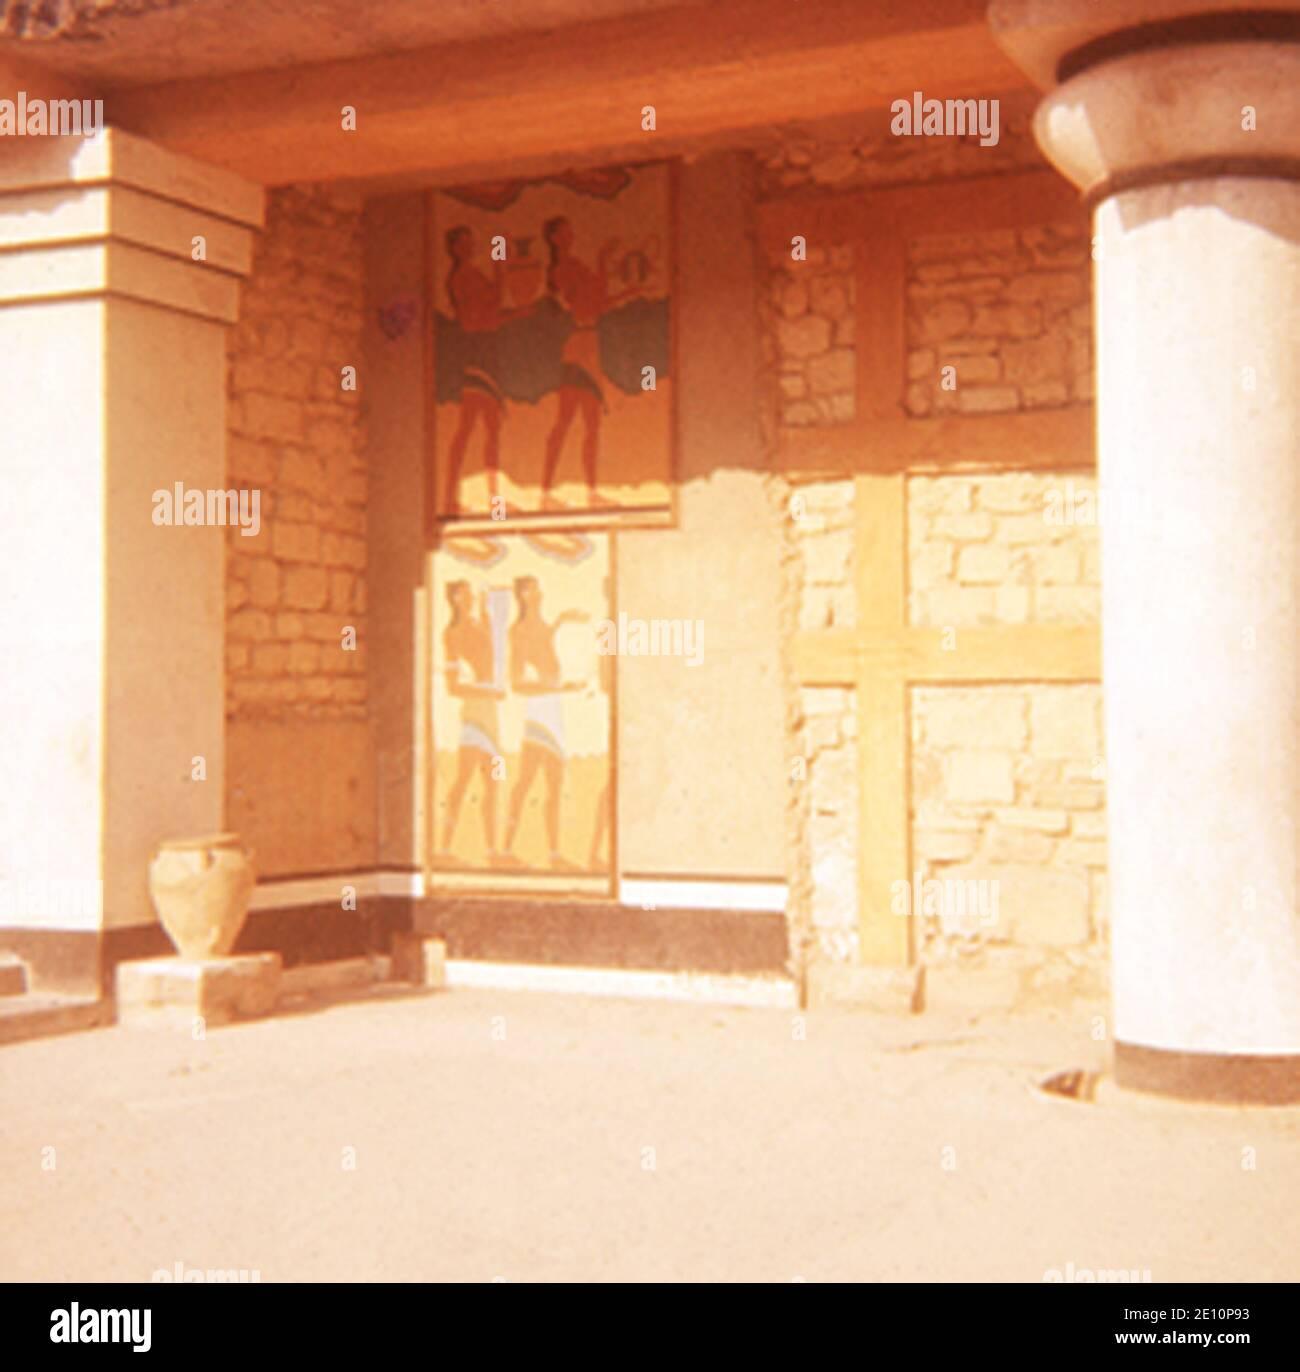 Antica Pittura Murale Immagini E Fotos Stock Alamy